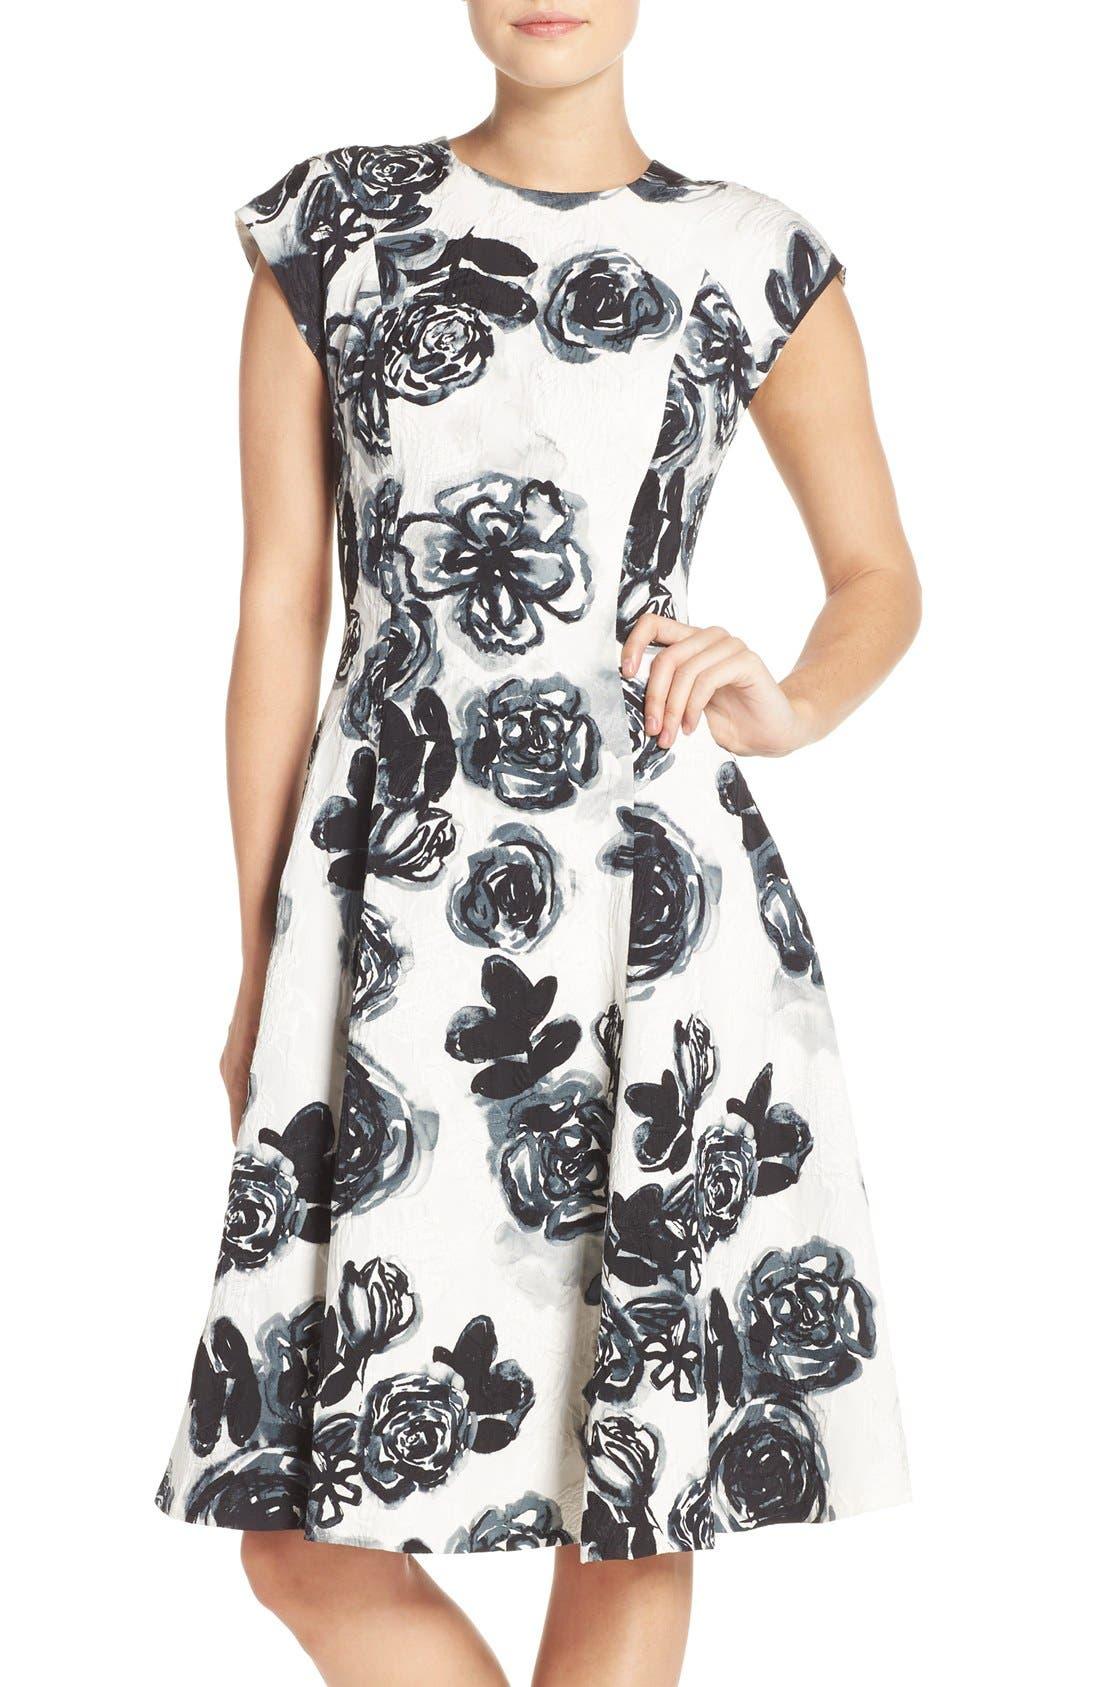 Alternate Image 1 Selected - Sachin & Babi Noir 'Desiree' Floral Jacquard Fit & Flare Dress